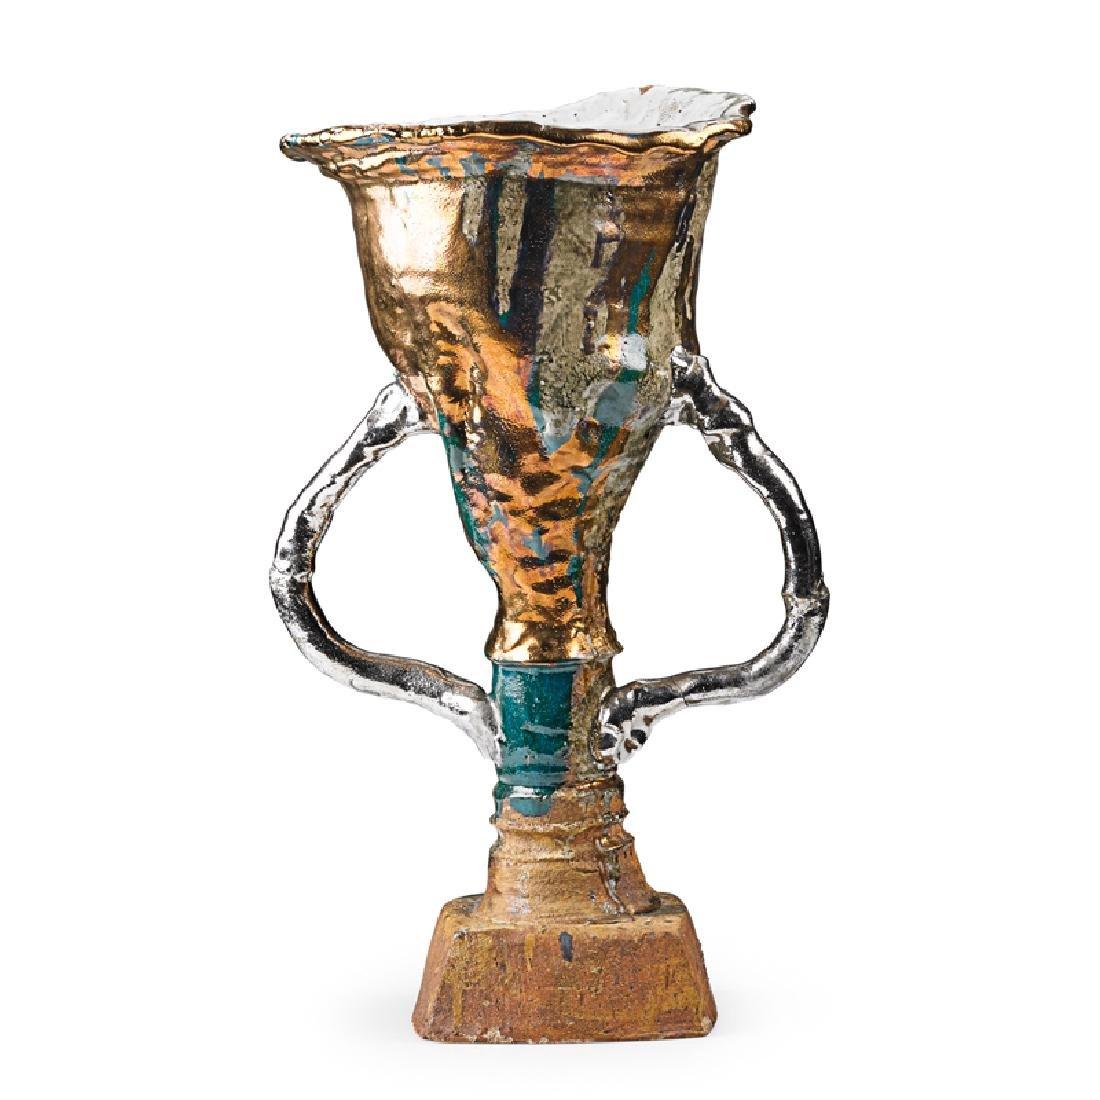 ROBERT ARNESON Untitled trophy